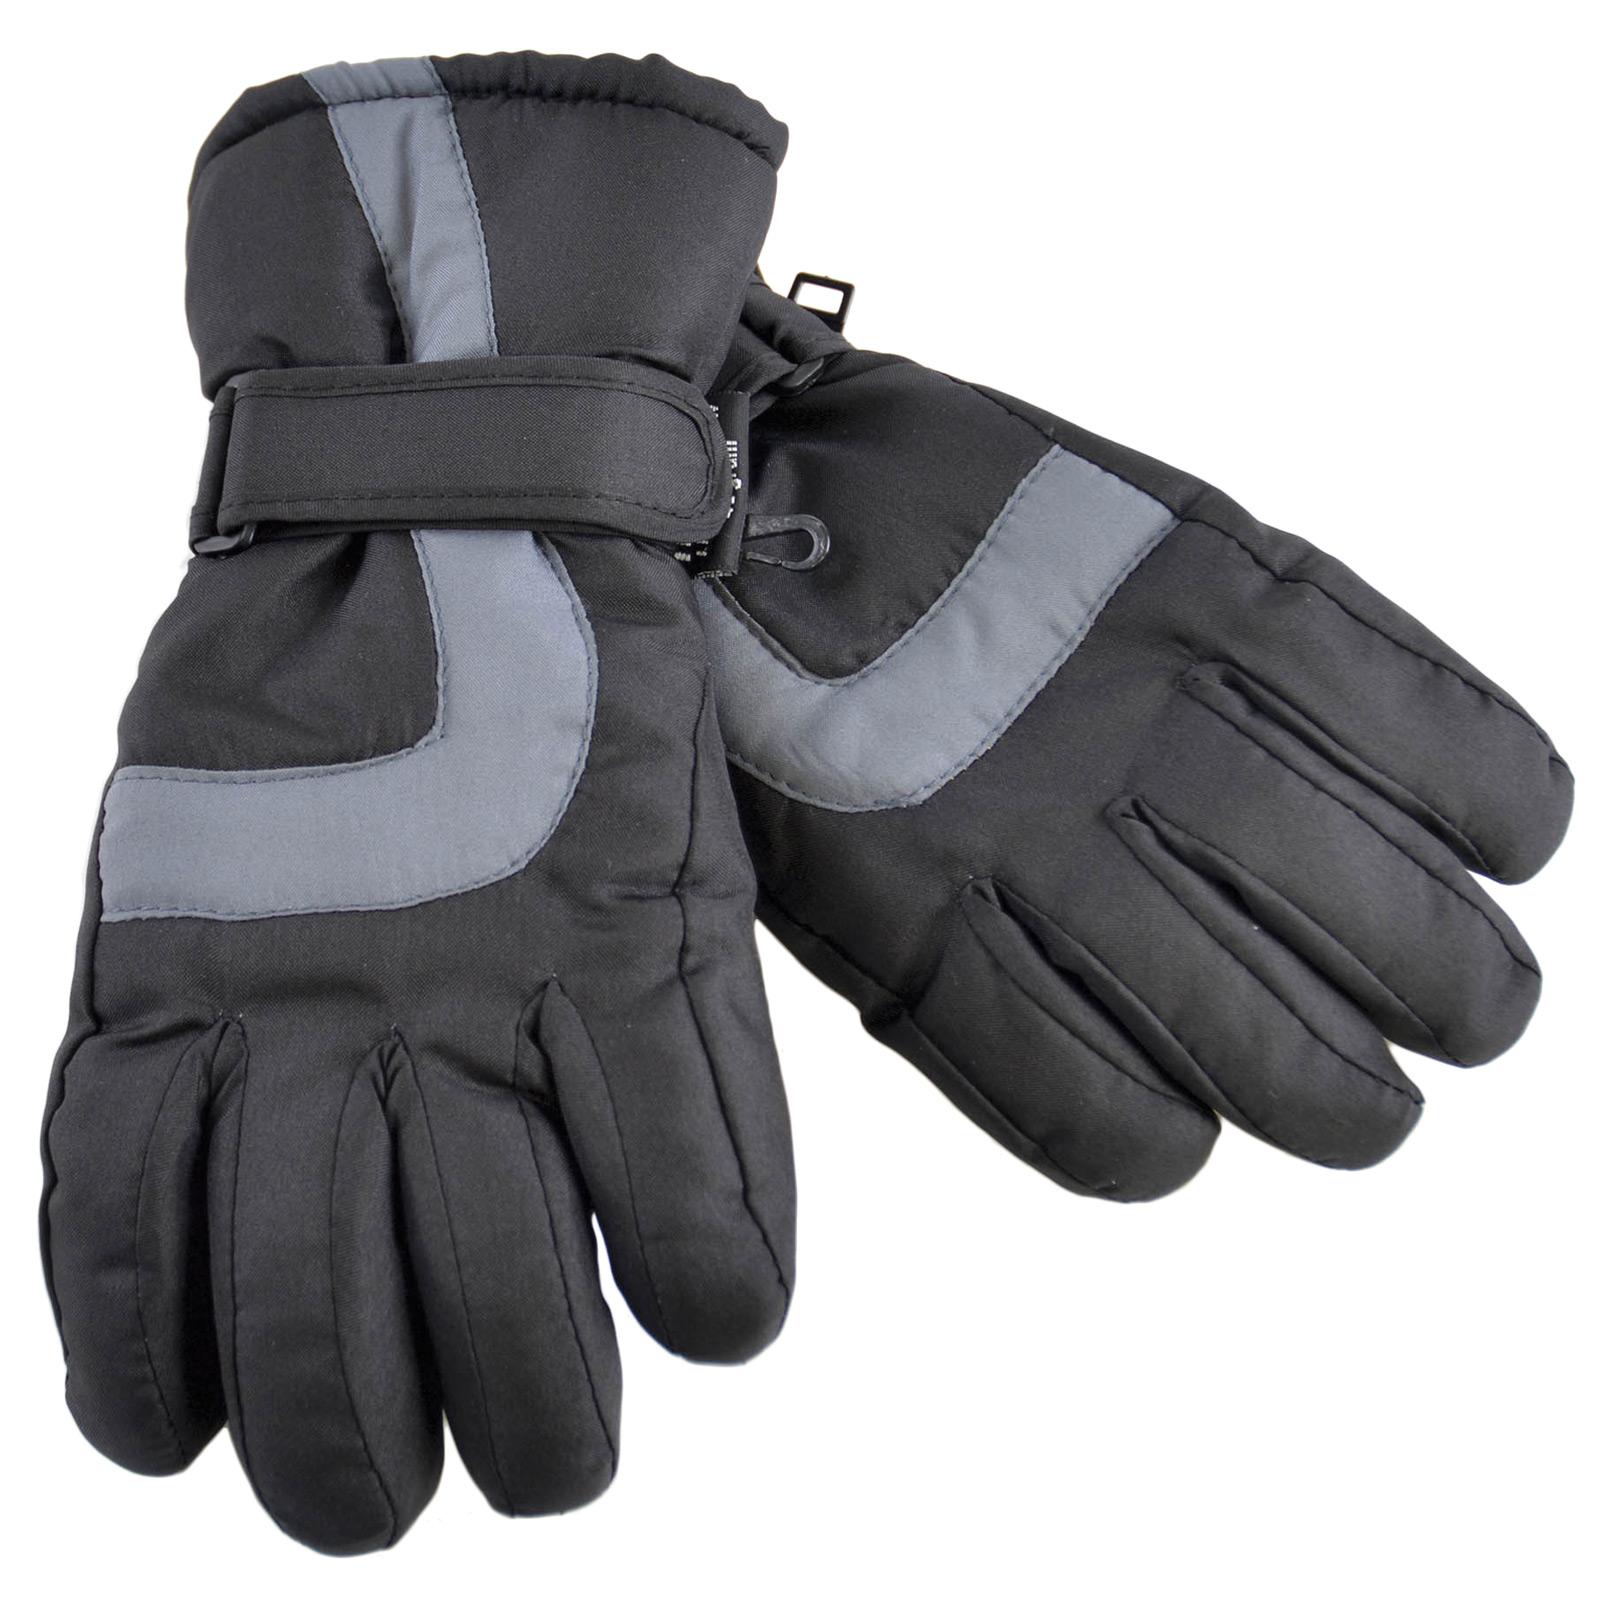 Kids Black & Grey Ski Gloves PVC Palm Grip Lined Warm